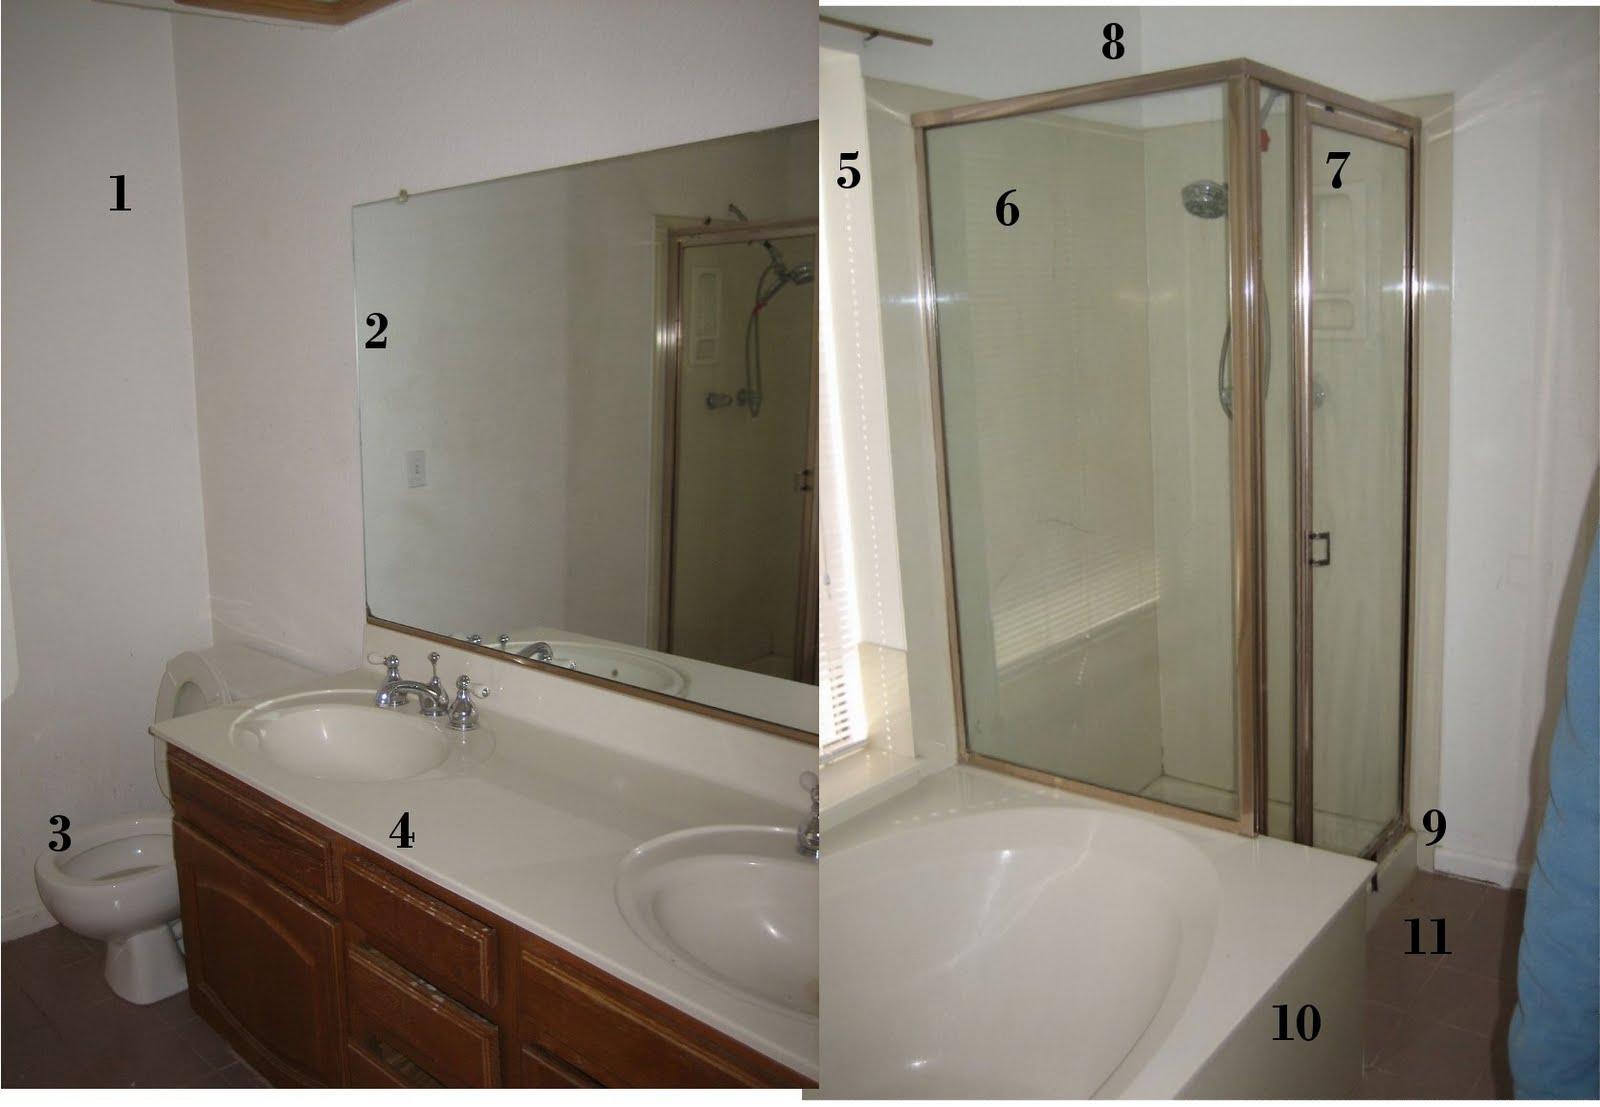 bathtub paint home depot home painting ideas. Black Bedroom Furniture Sets. Home Design Ideas